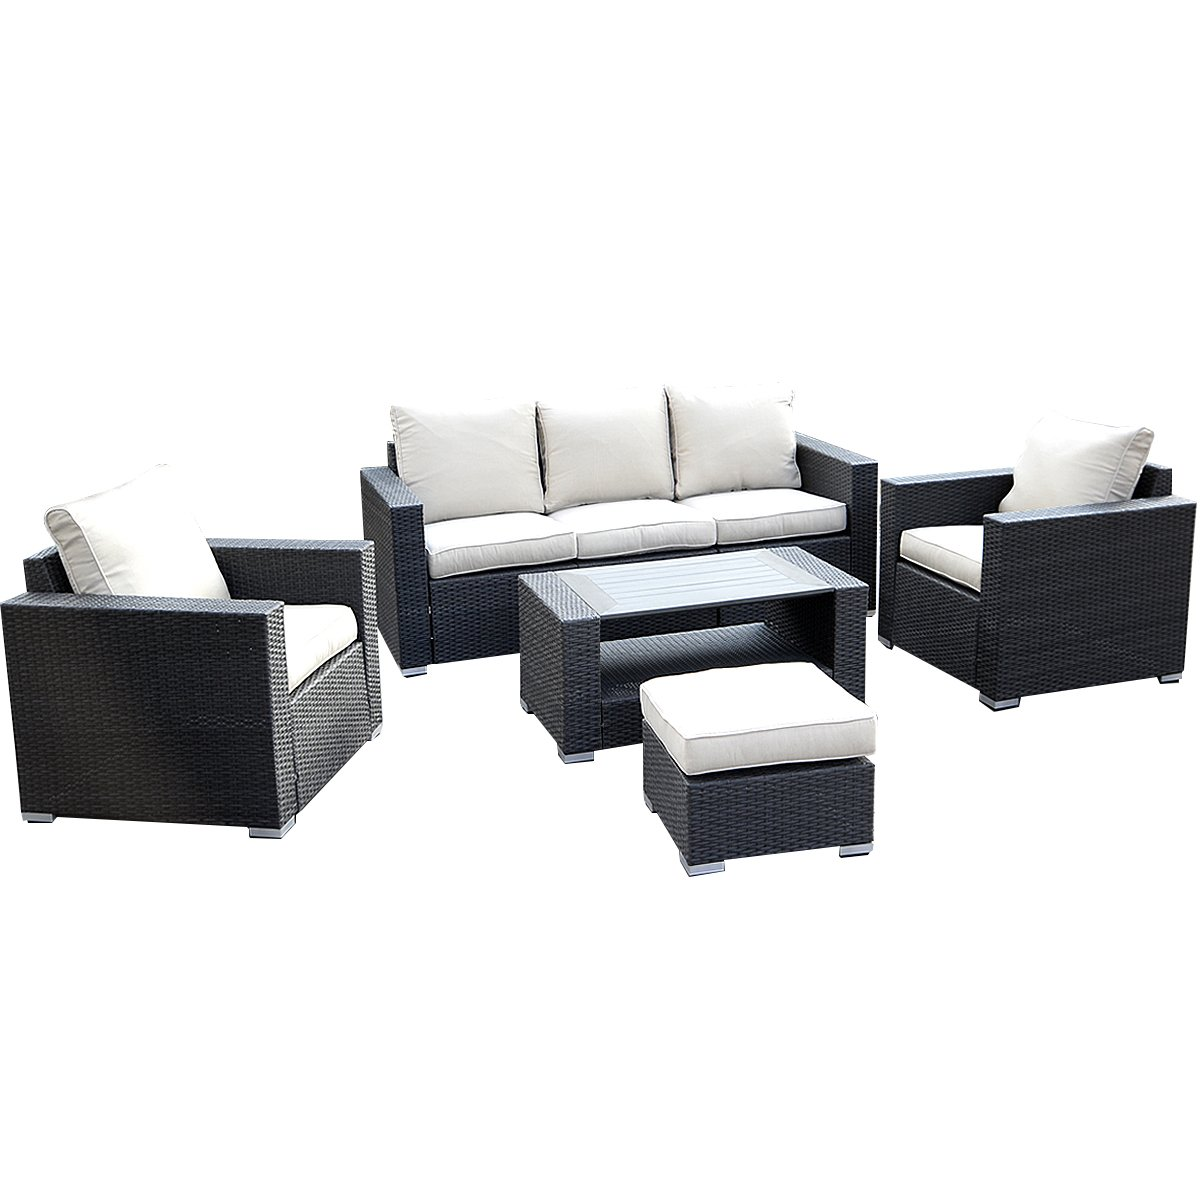 Amazon.de: 17tlg. Lounge Set Gartenmöbel Loungemöbel Polyratten ...